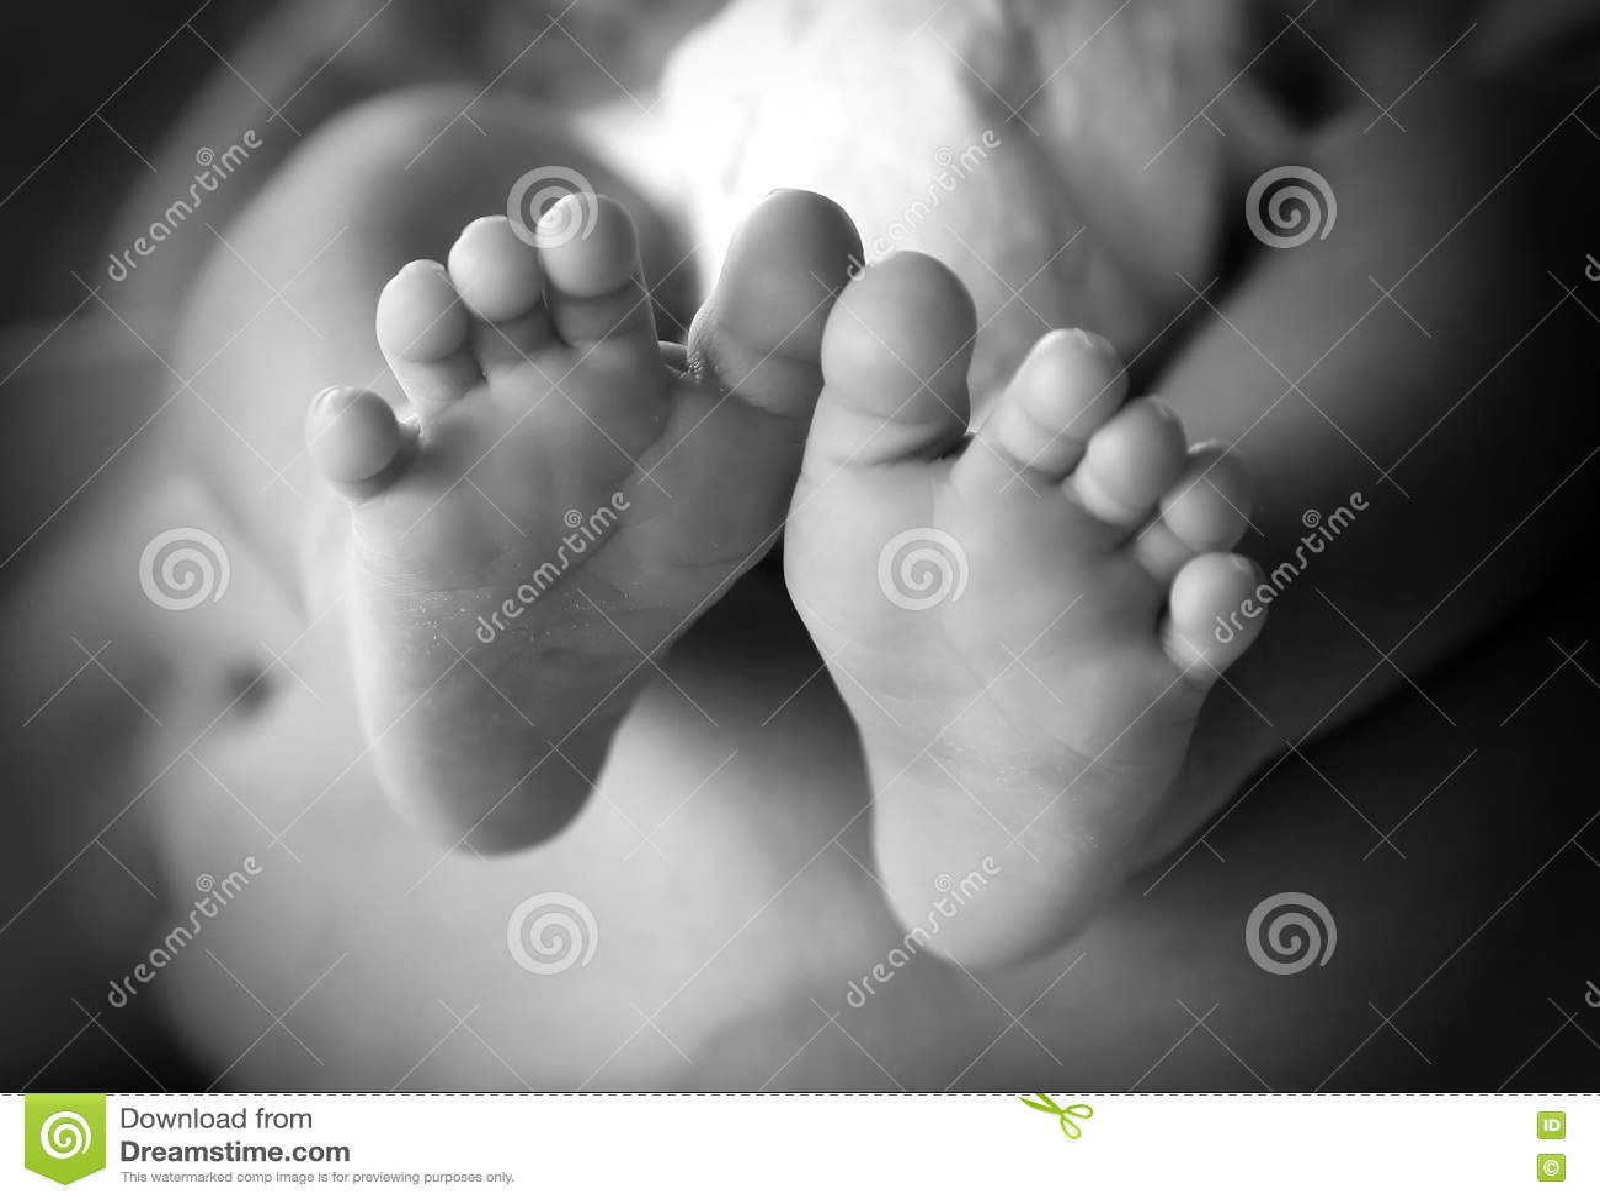 Photo of newborn baby feet in soft focus